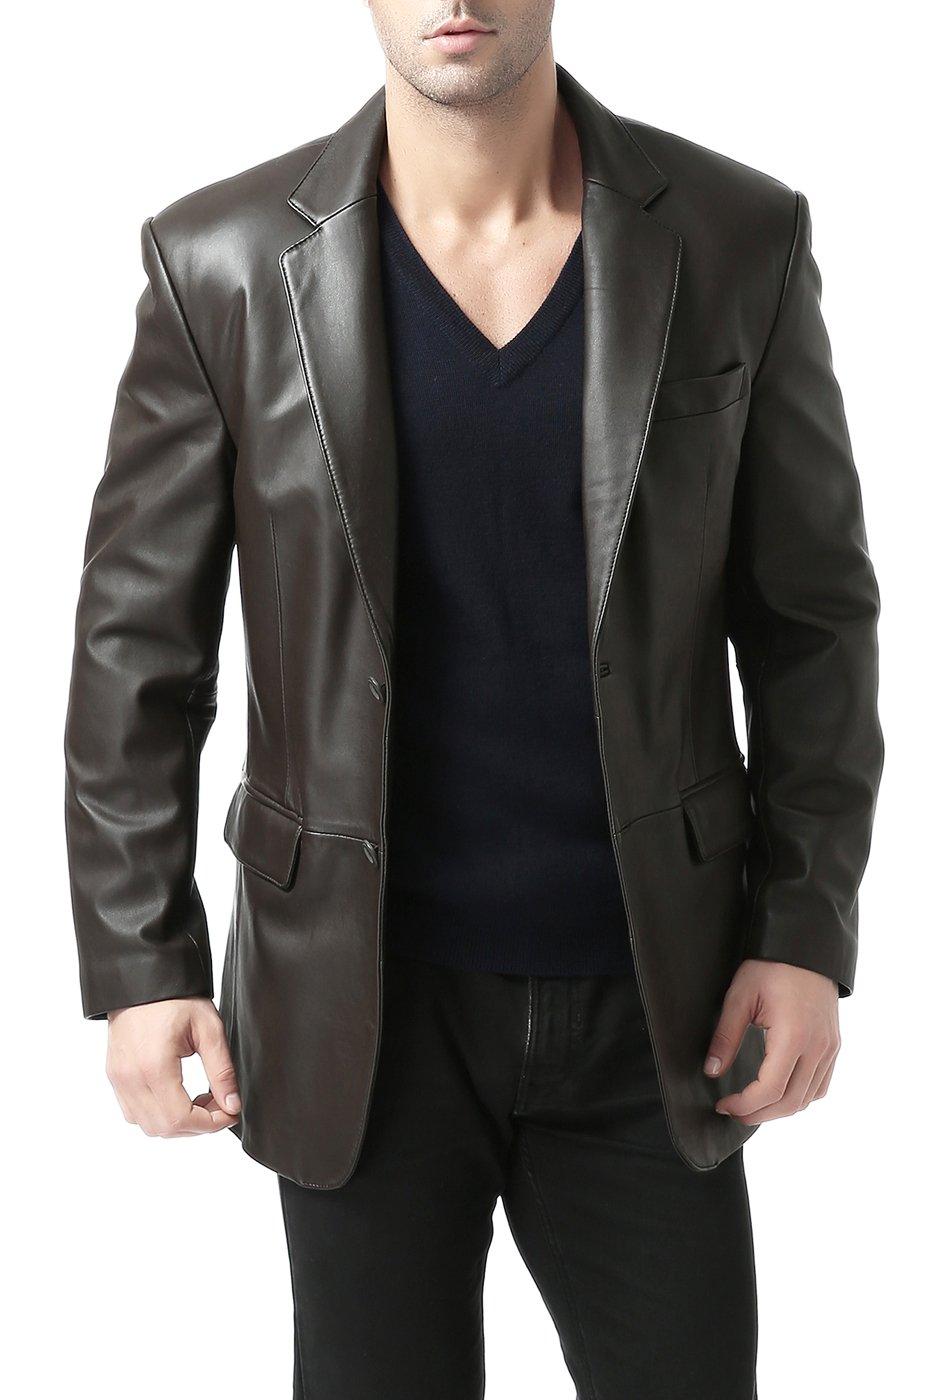 BGSD Men's Brown Leather Blazer Lambskin Sport Coat Jacket (Regular Big & Tall and Short)